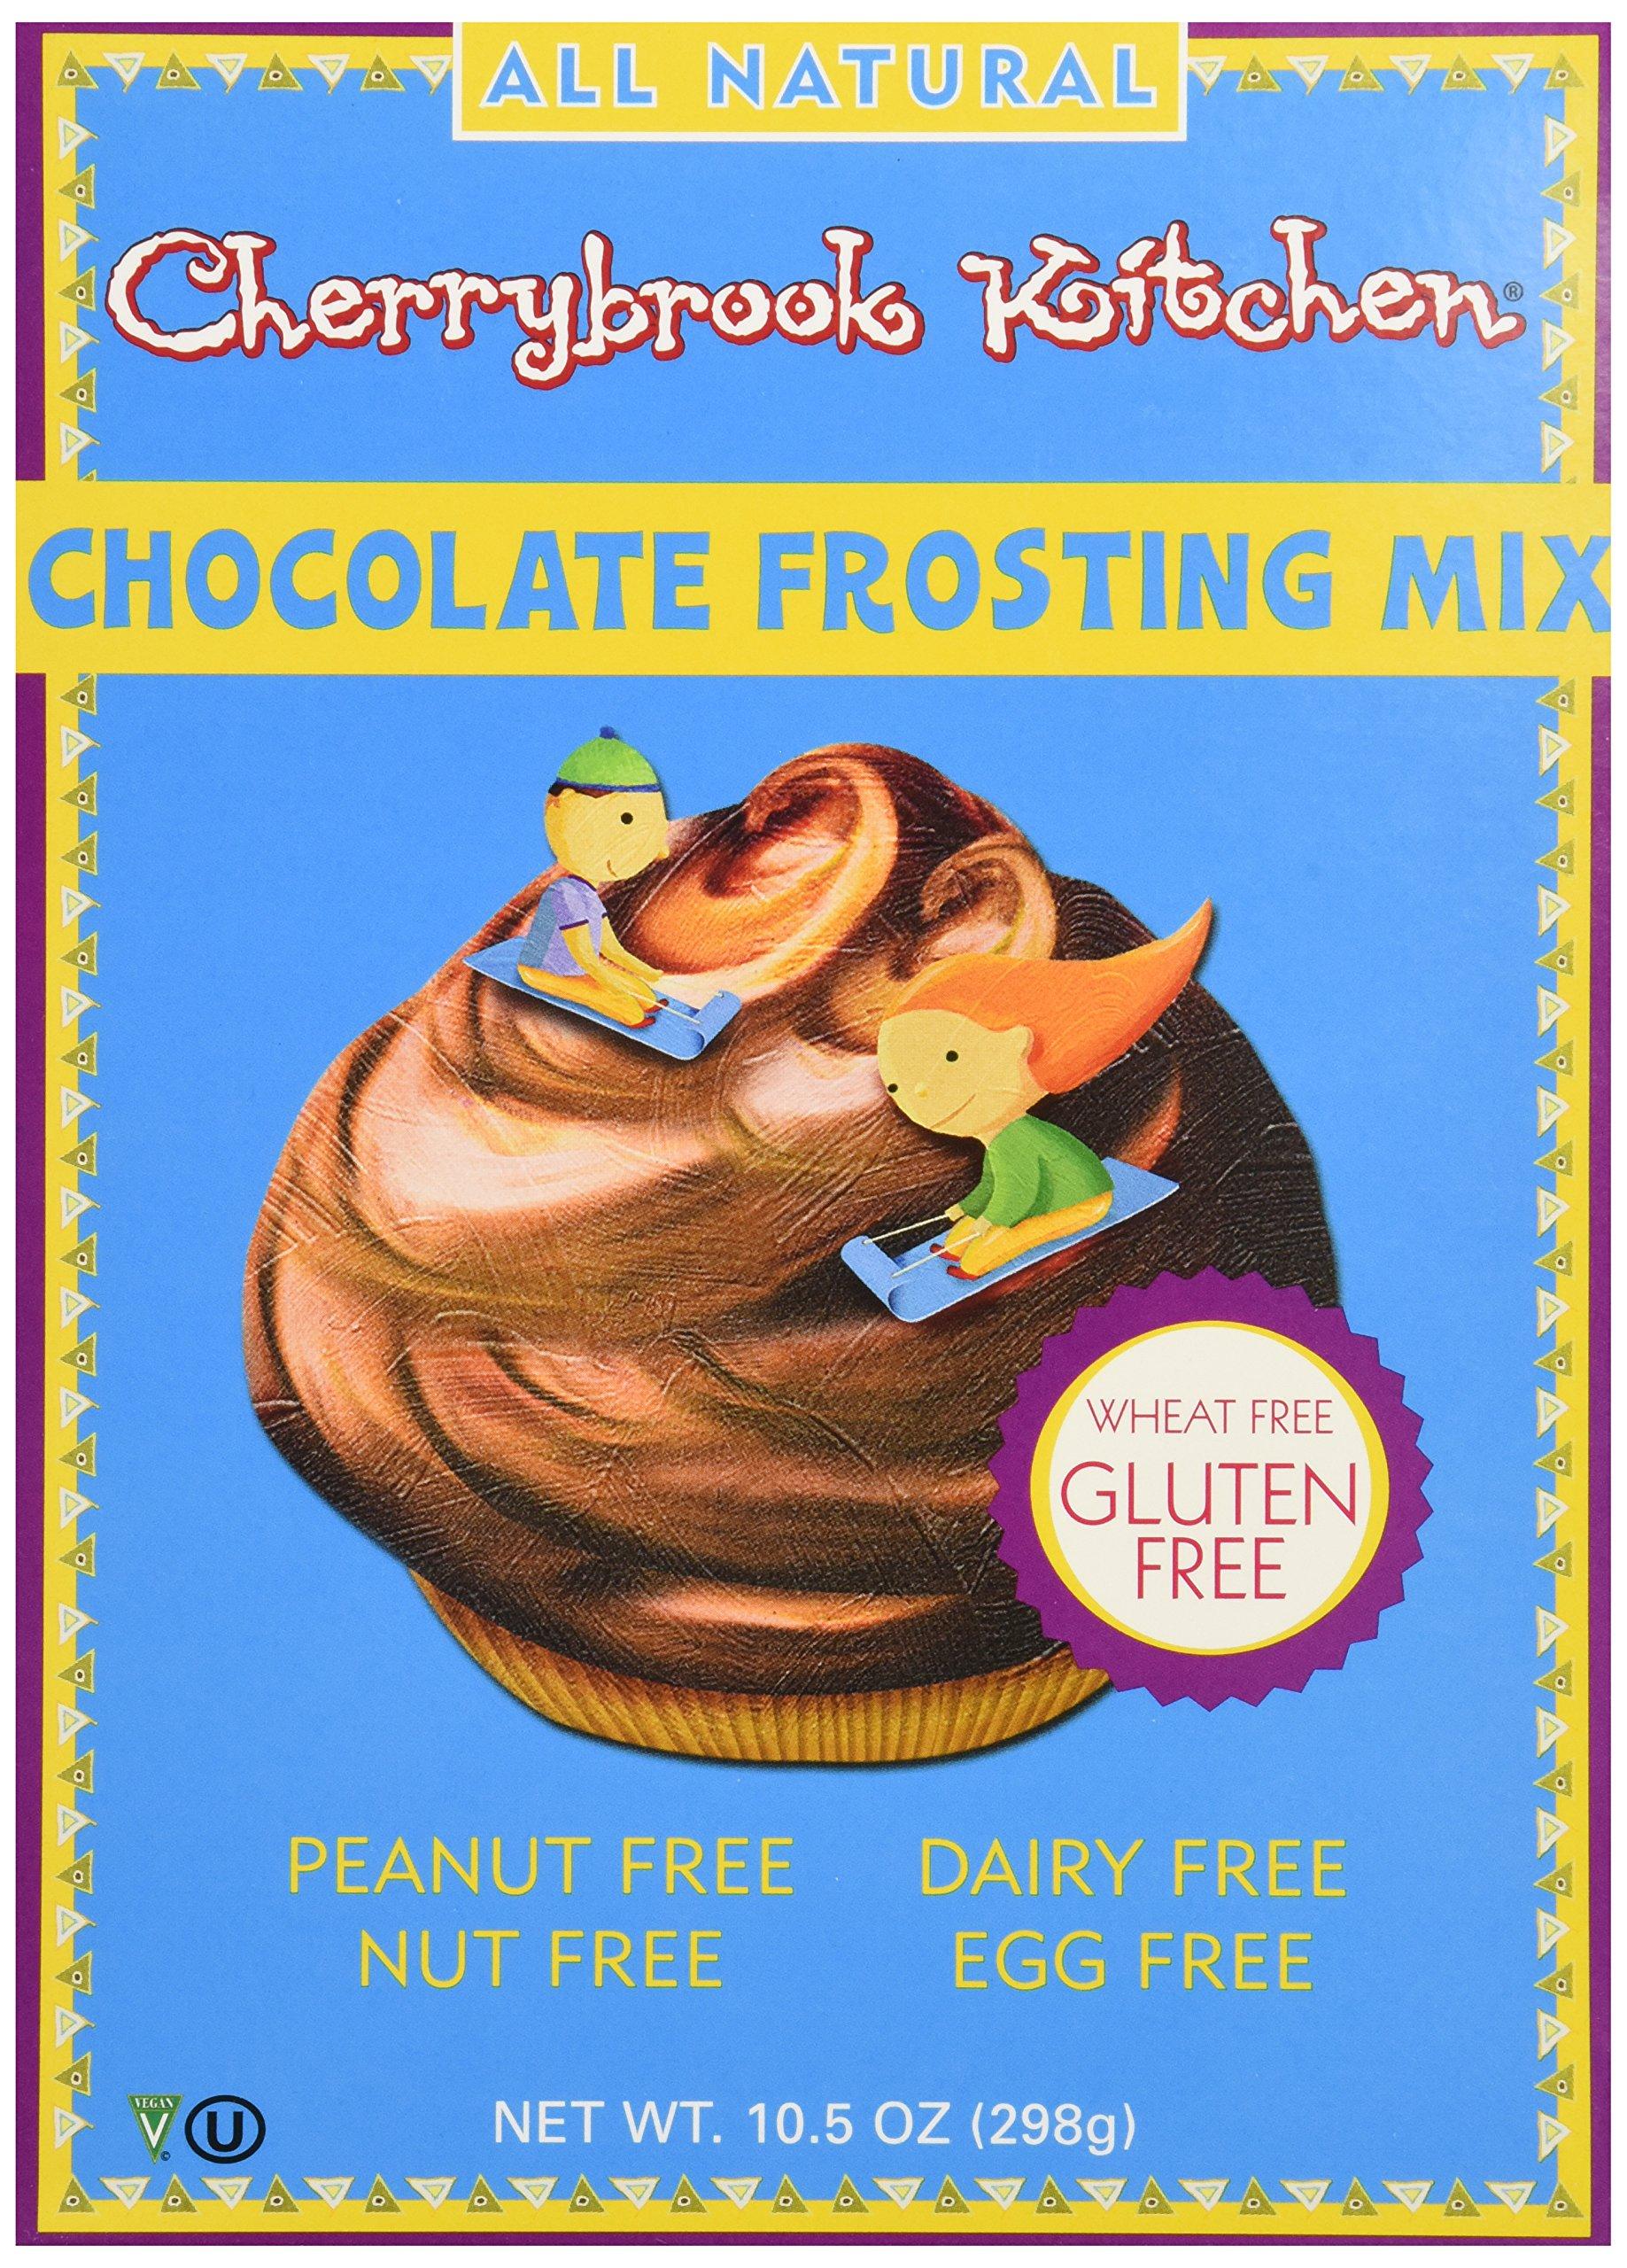 Cherrybrook Kitchen Chocolate Frosting Mix, 10.5 oz